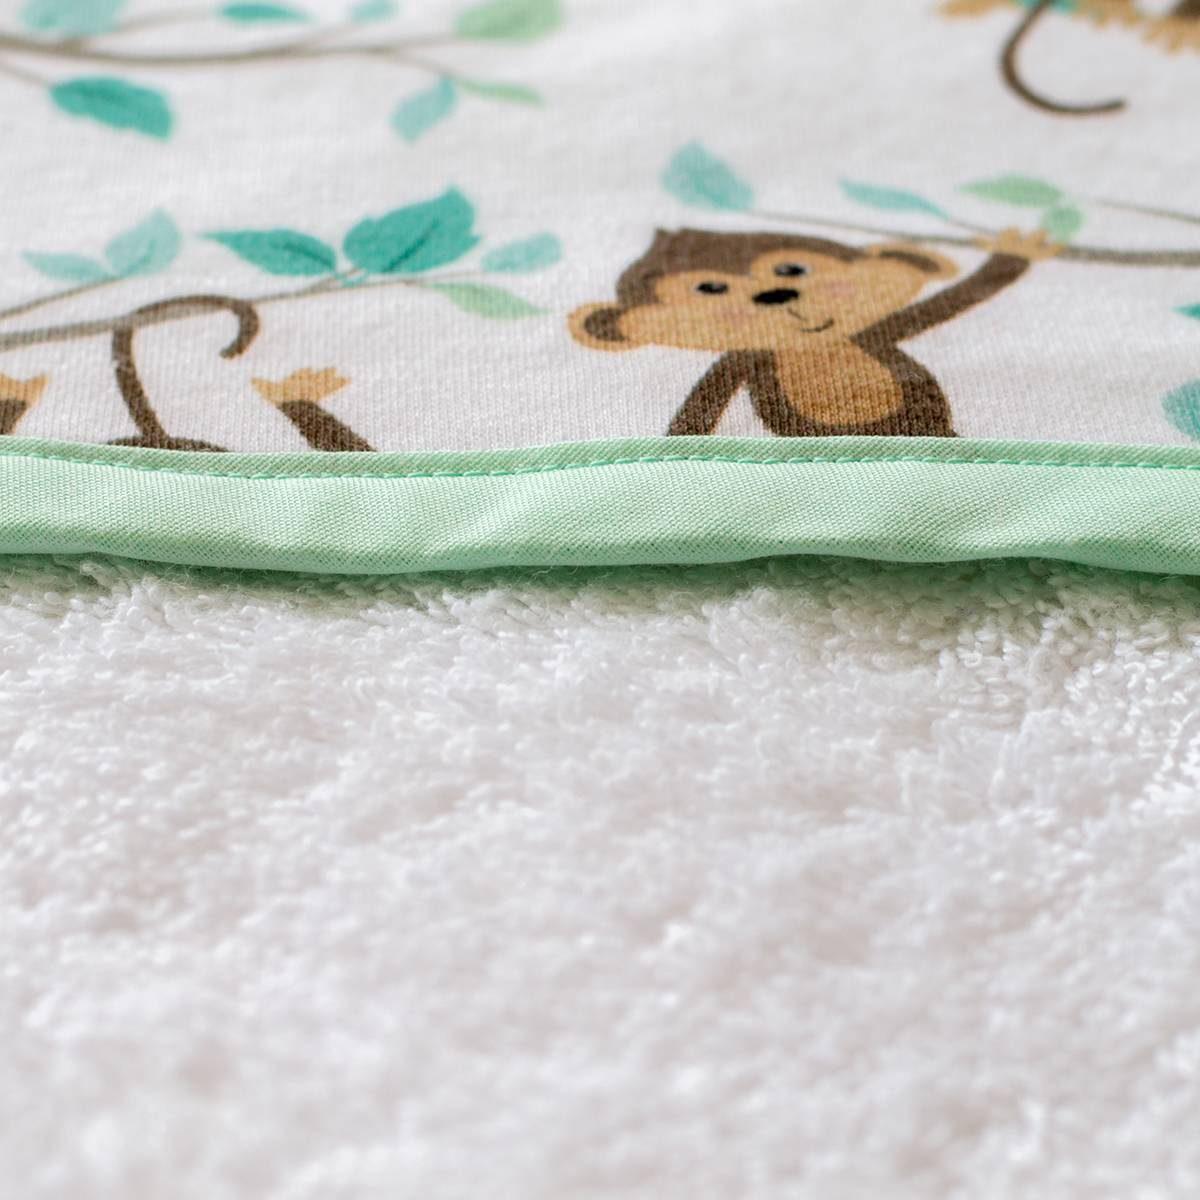 Capa de baño de monos en la jungla